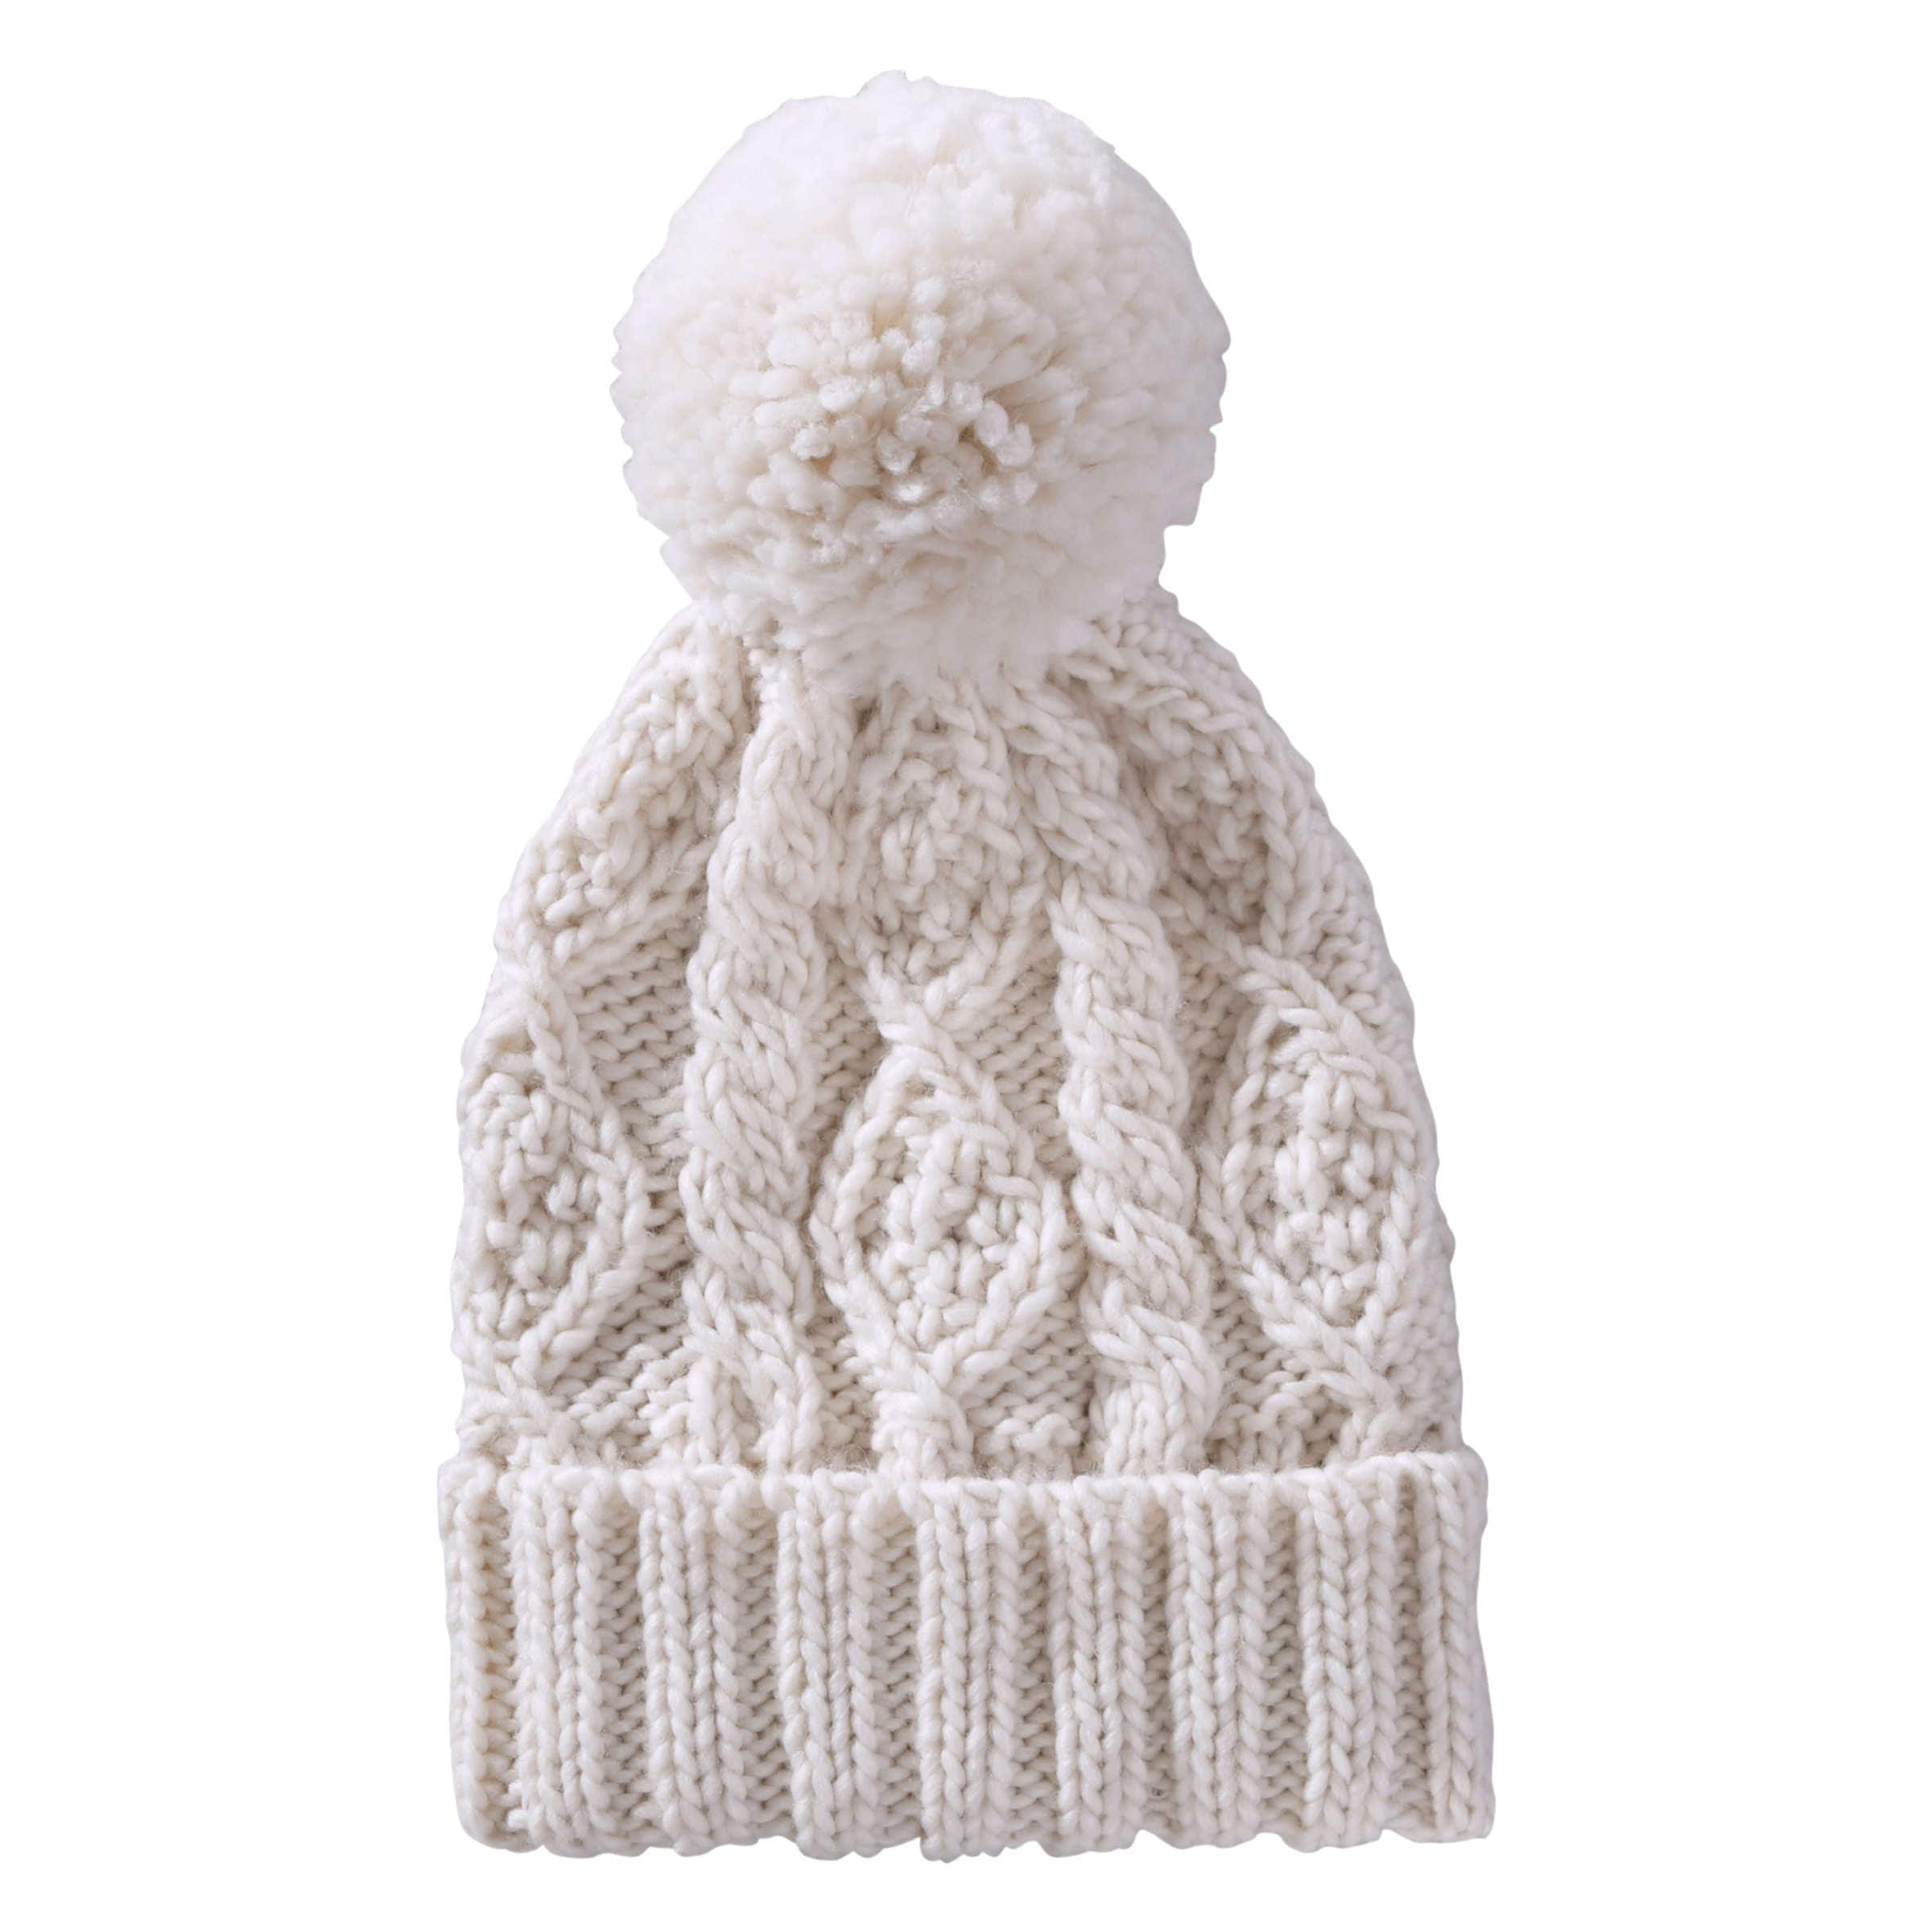 4ee20d4333b Cable Knit Winter Hat in Ecru from Joe Fresh